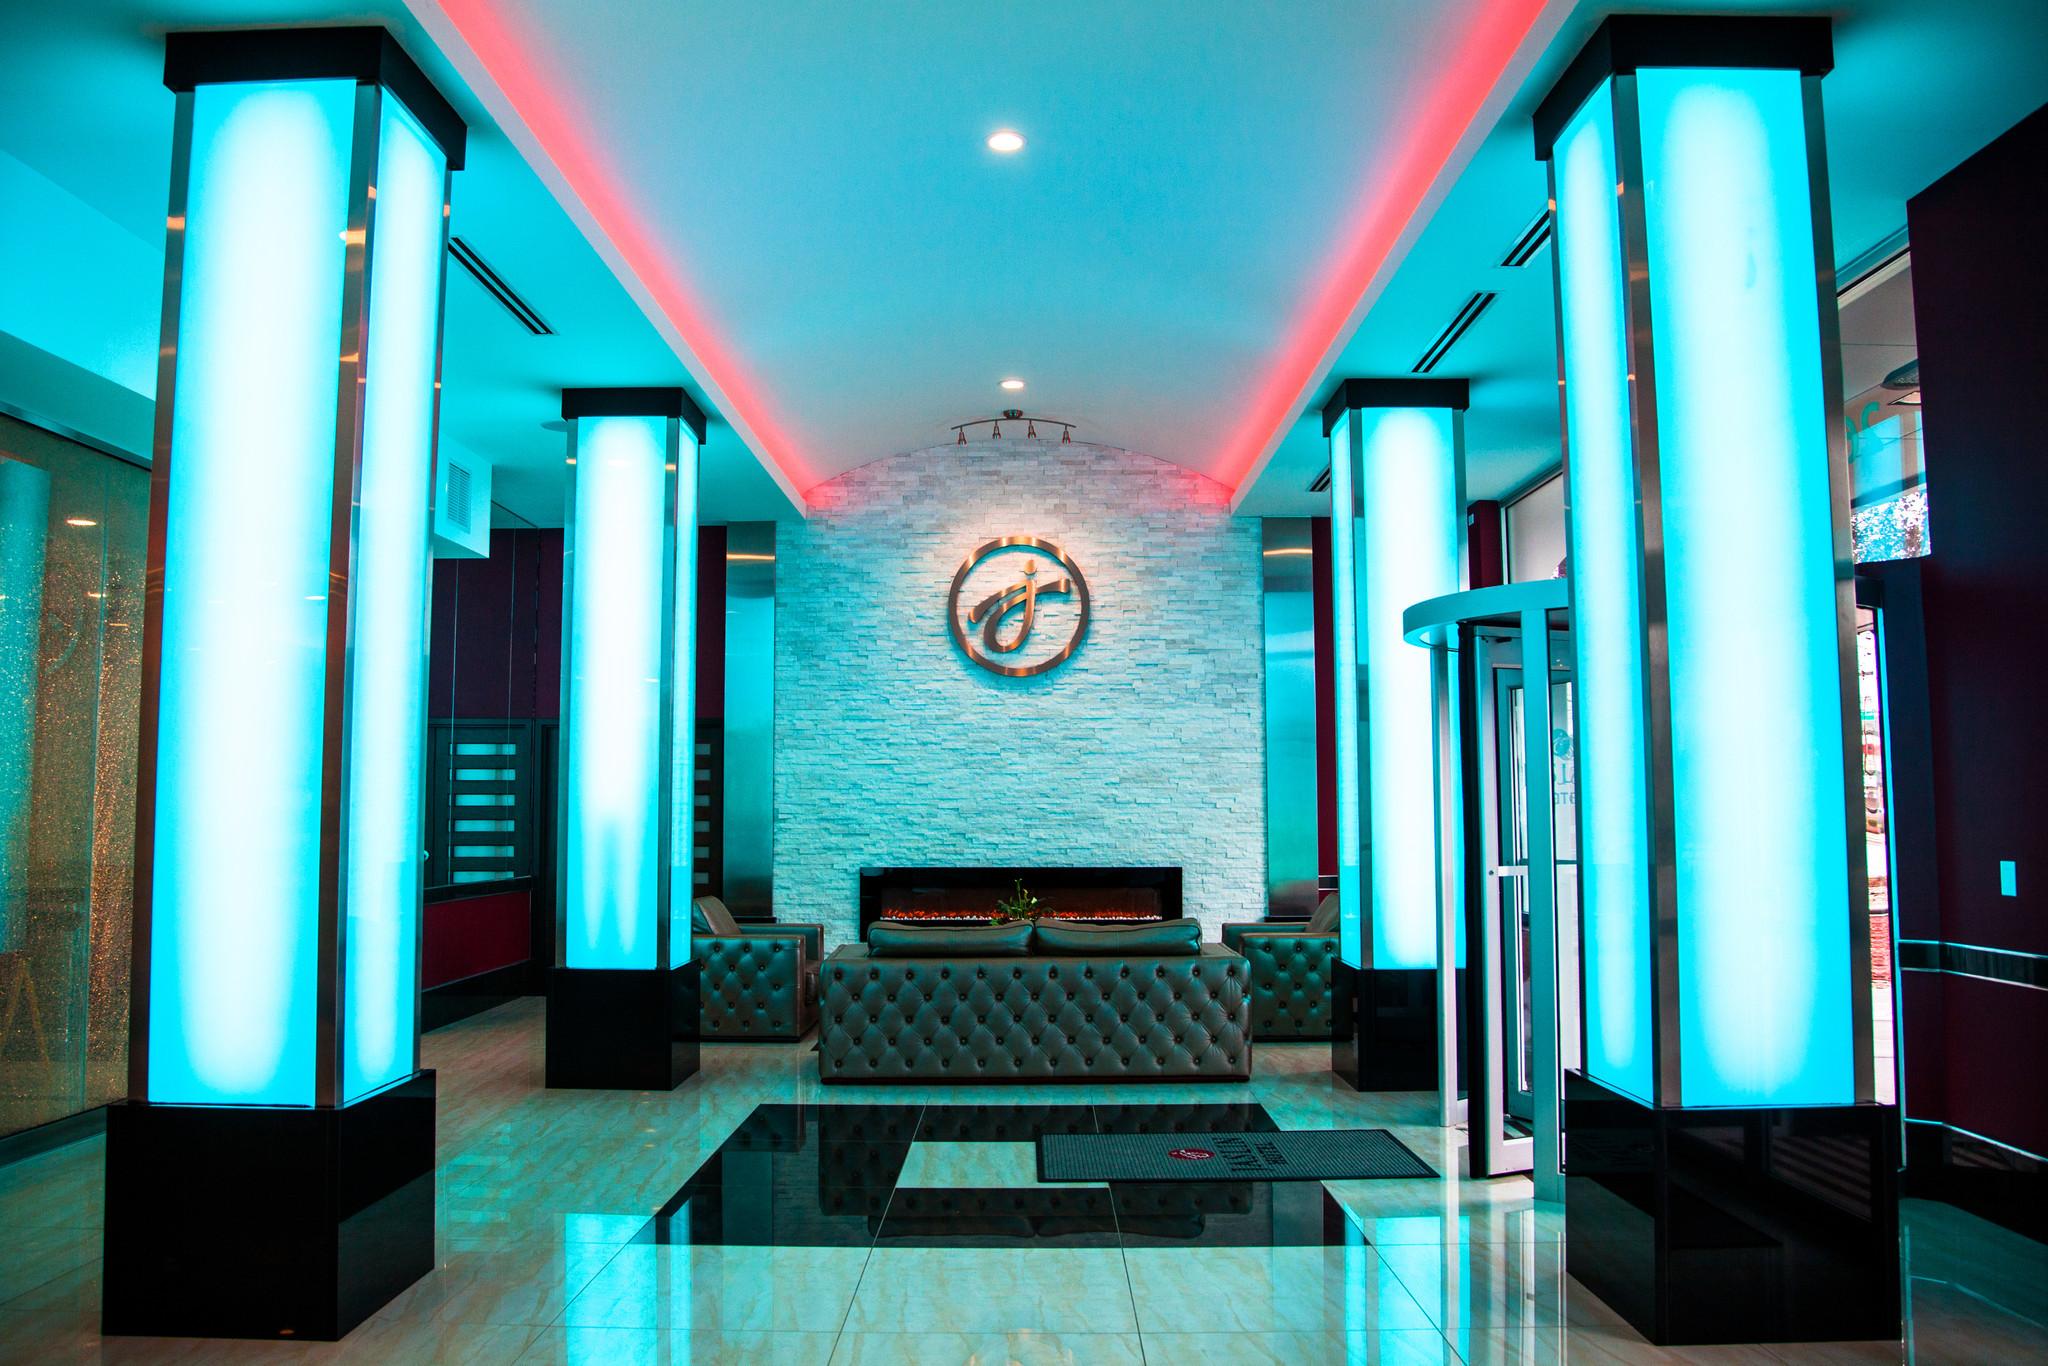 17 Chicago hotel lobbies even locals should visit